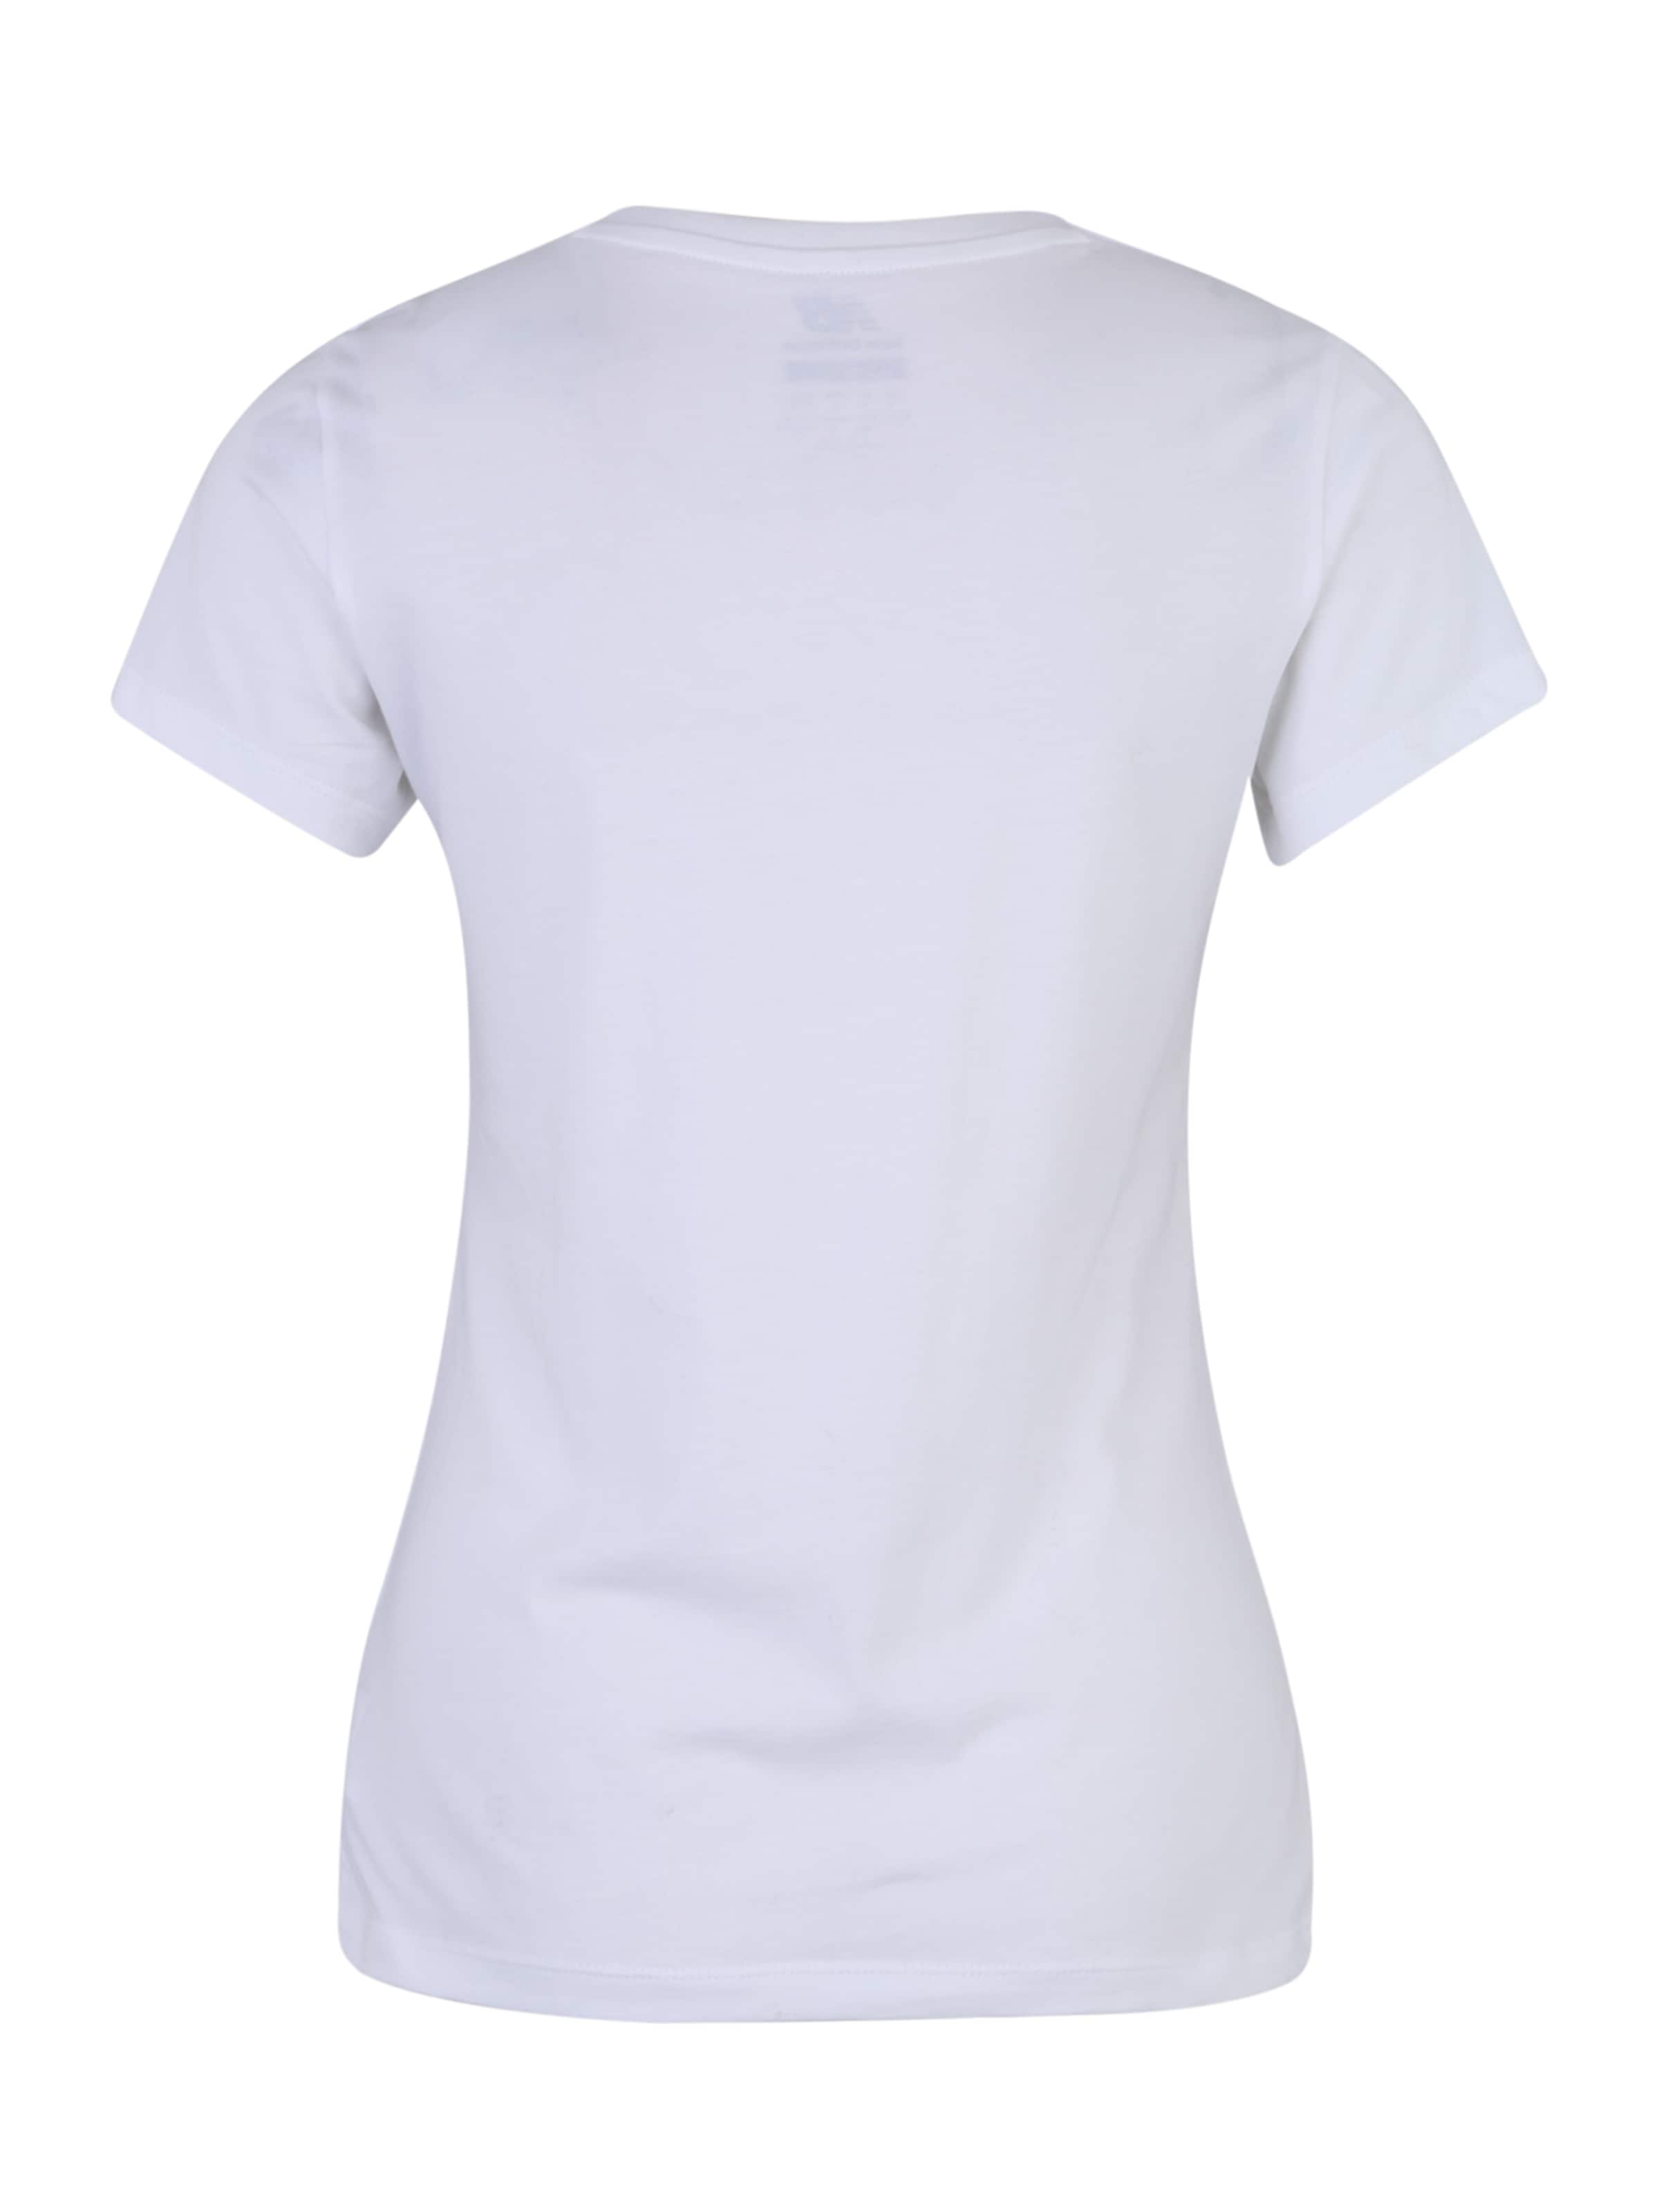 New MischfarbenWeiß In New Balance Shirt cFKlJ1